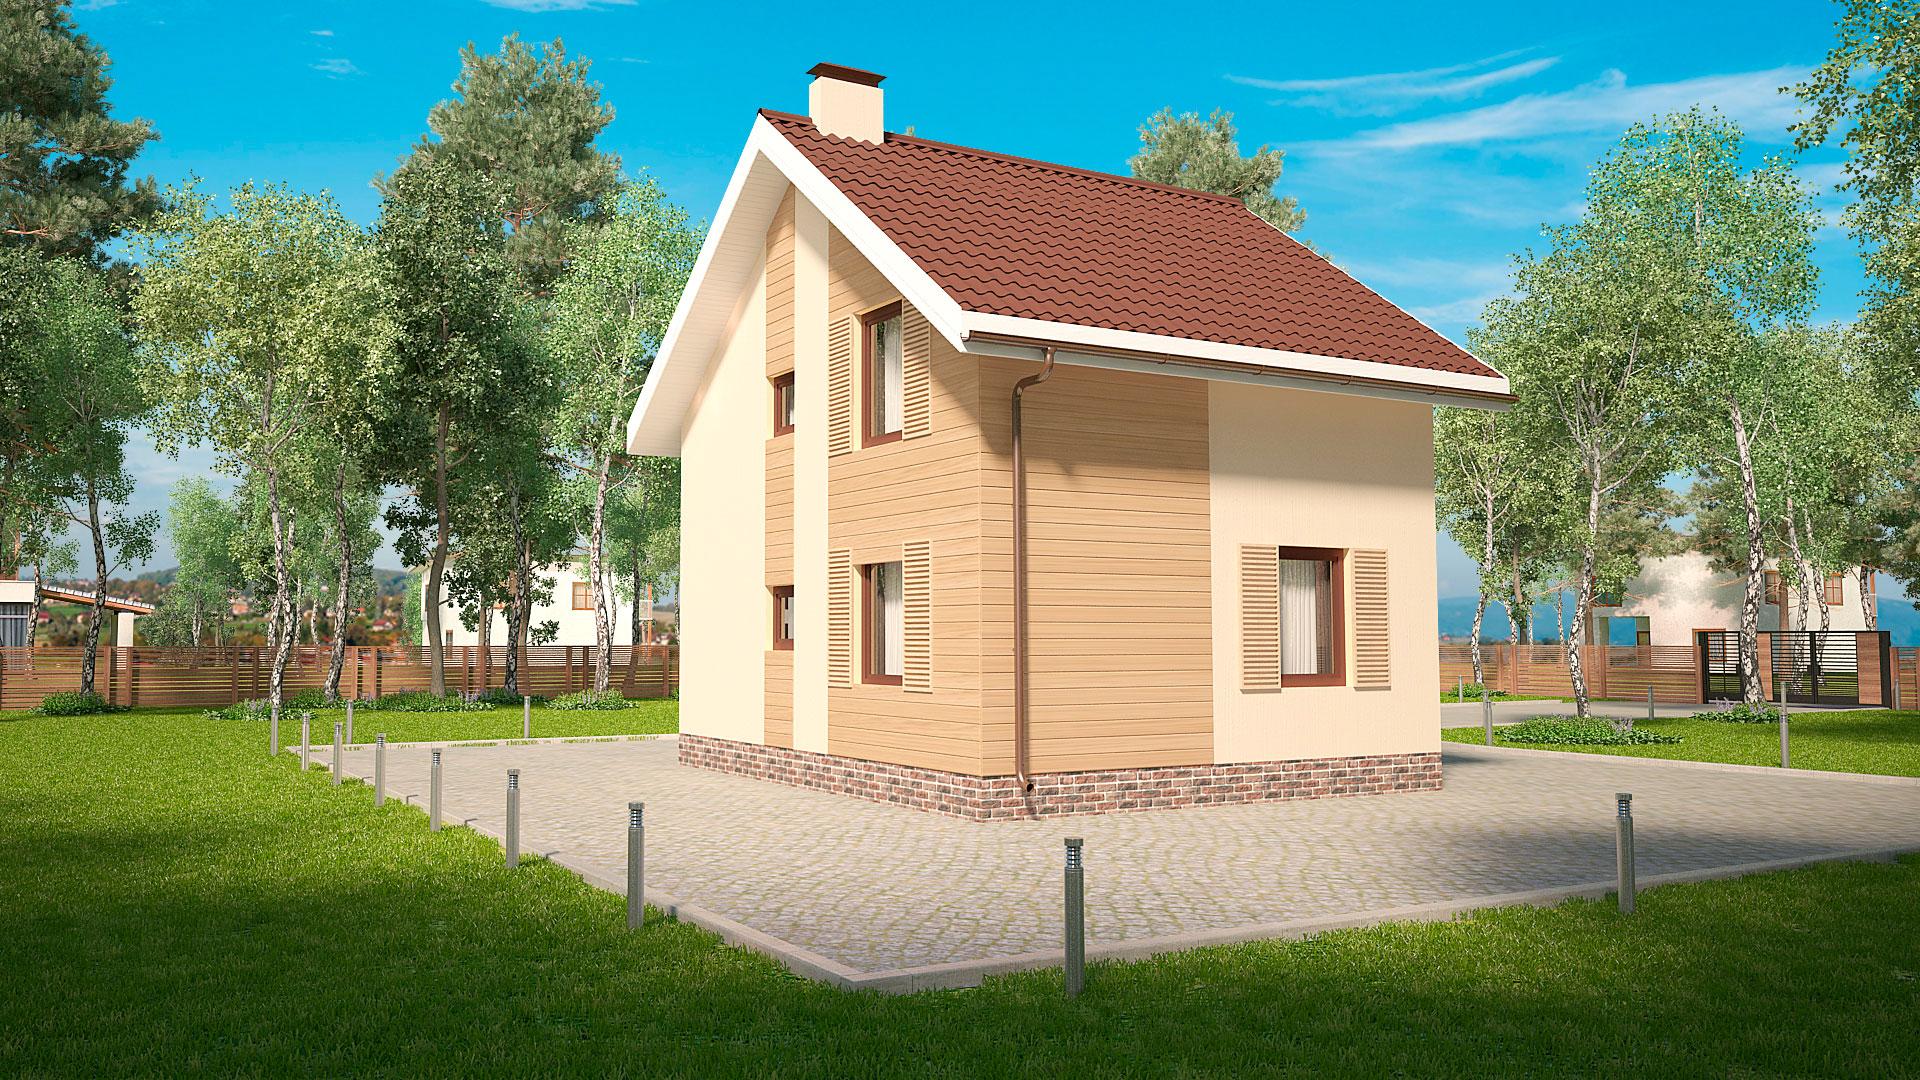 Боковой фасад двухэтажного дома, проект БЭНПАН МС-89.